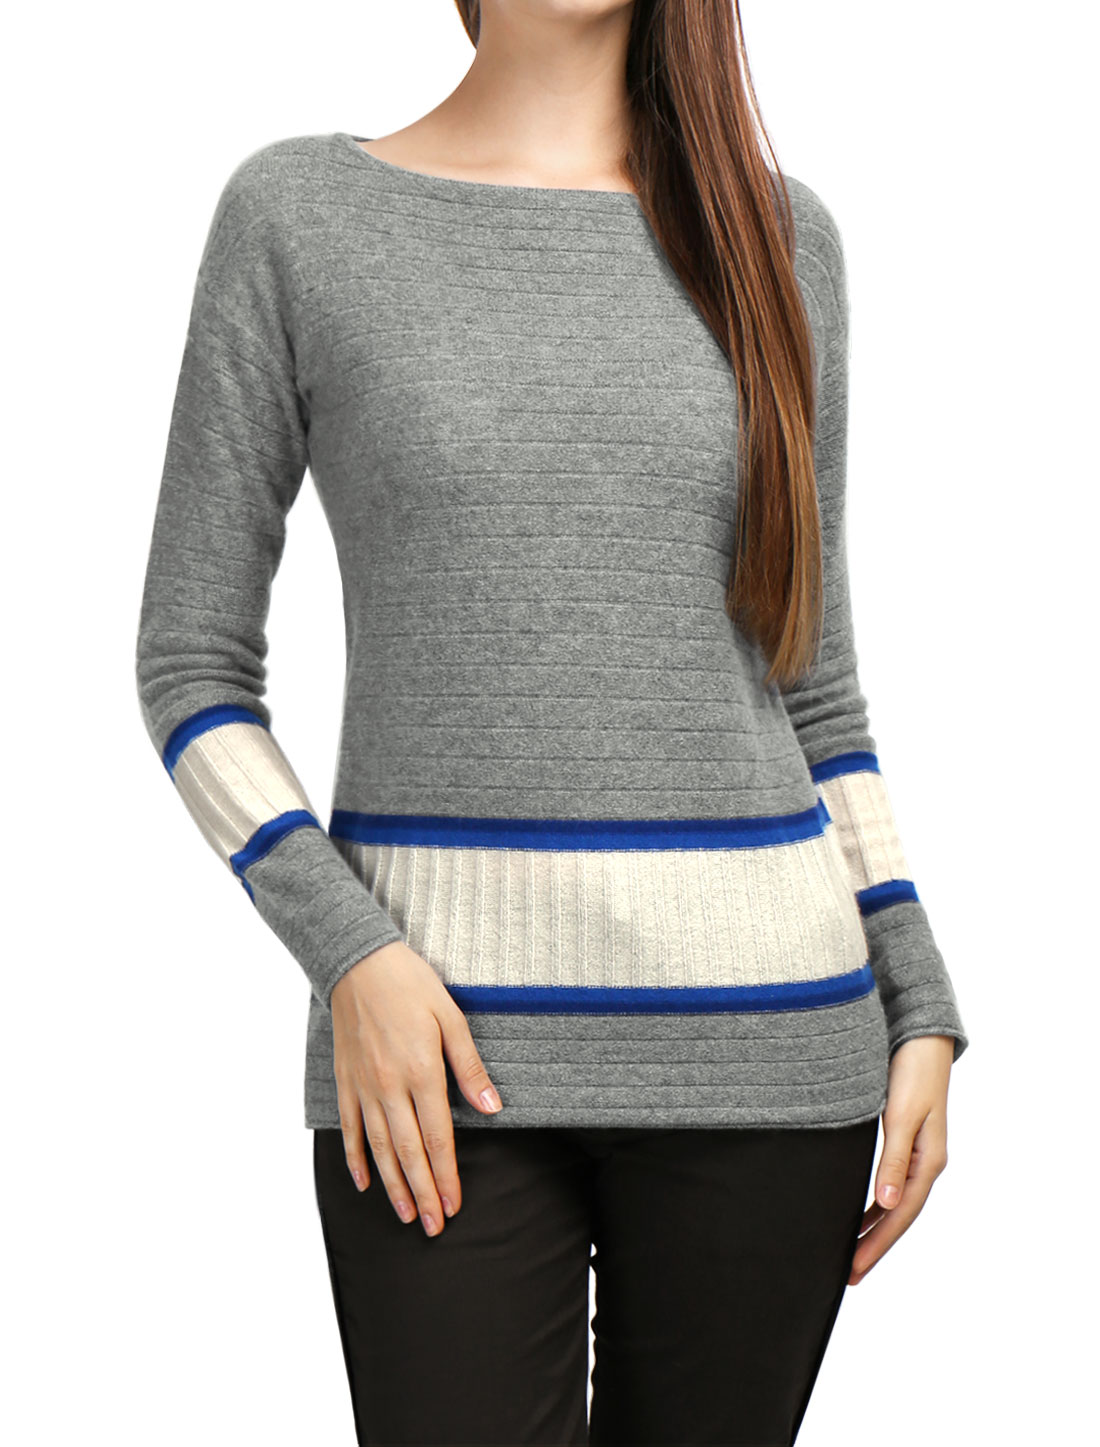 Women Boat Neck Jersey Contrast Rib Knit Cashmere Sweater Blue XL